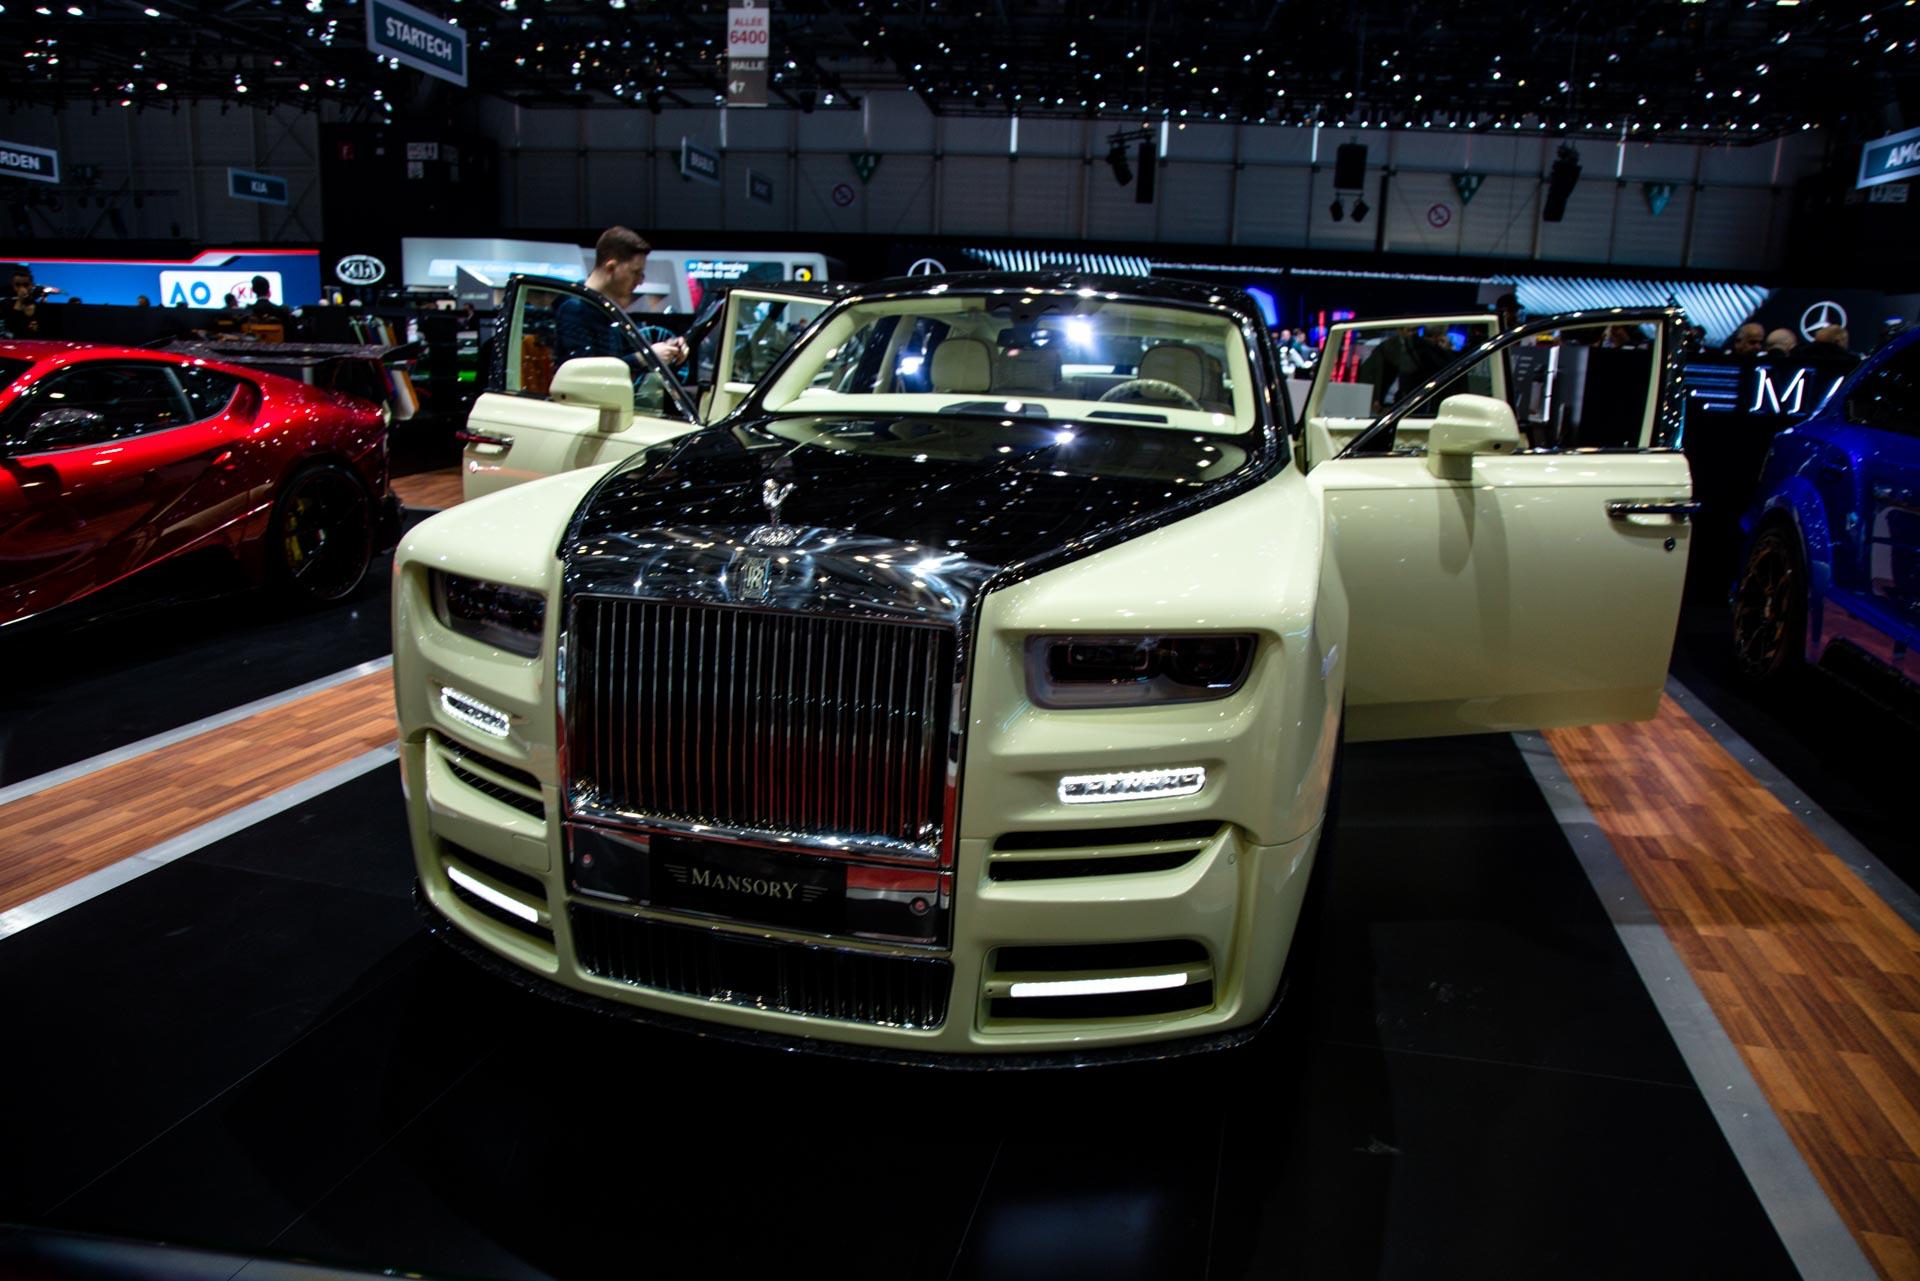 Mclaren P1 For Sale >> Mansory at the Geneva Motor Show 2018 - GTspirit